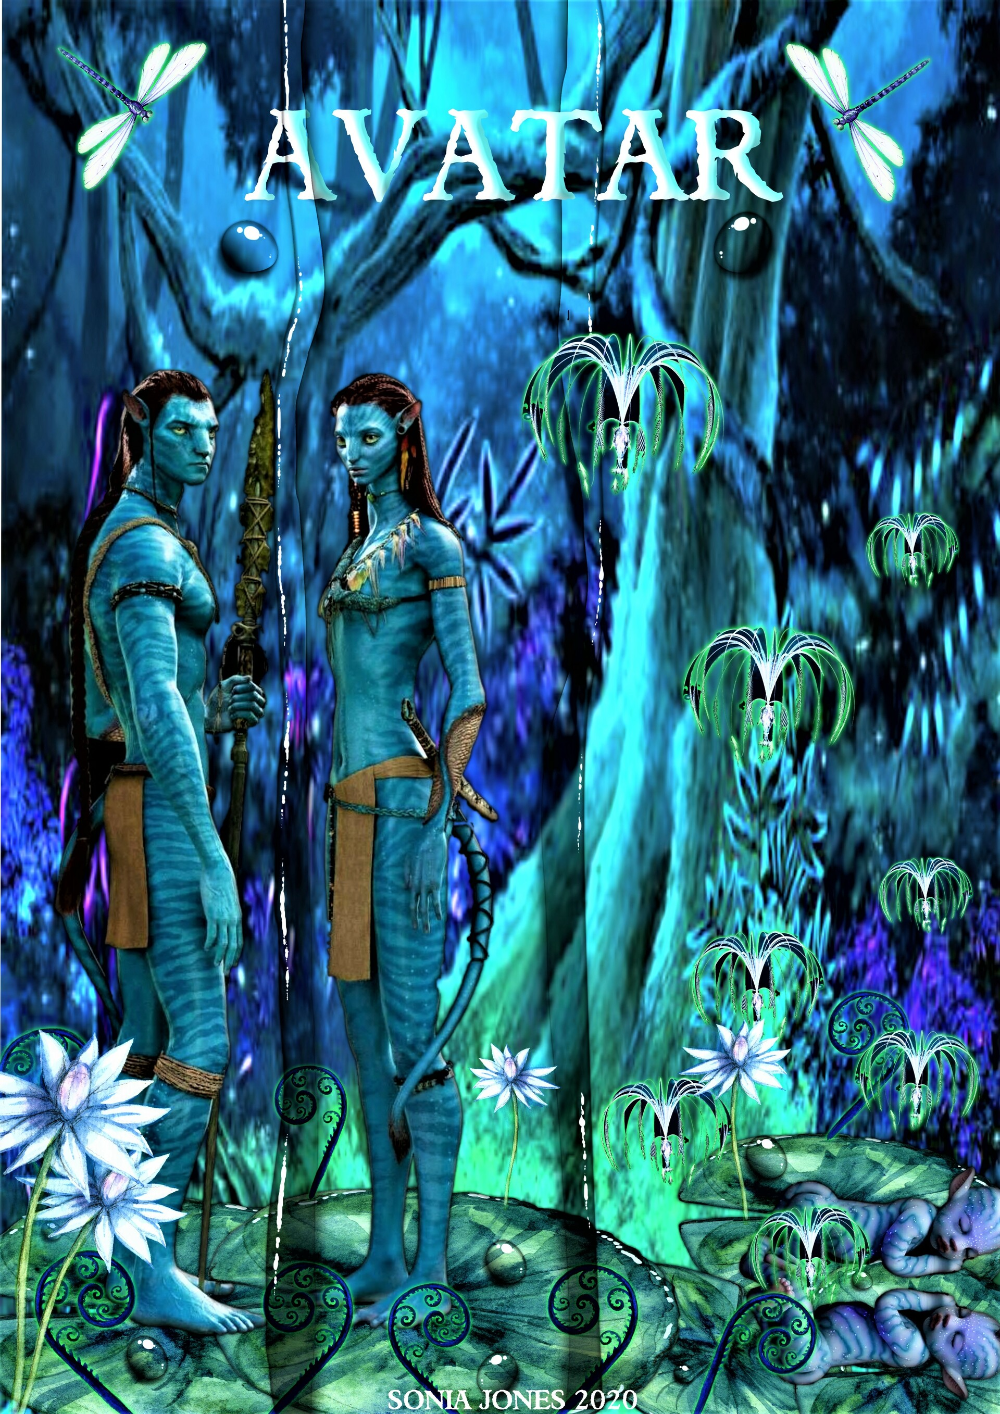 Artstation My Homage To Avatar The Movie Sonia Jones Homage Art Station Avatar Movie